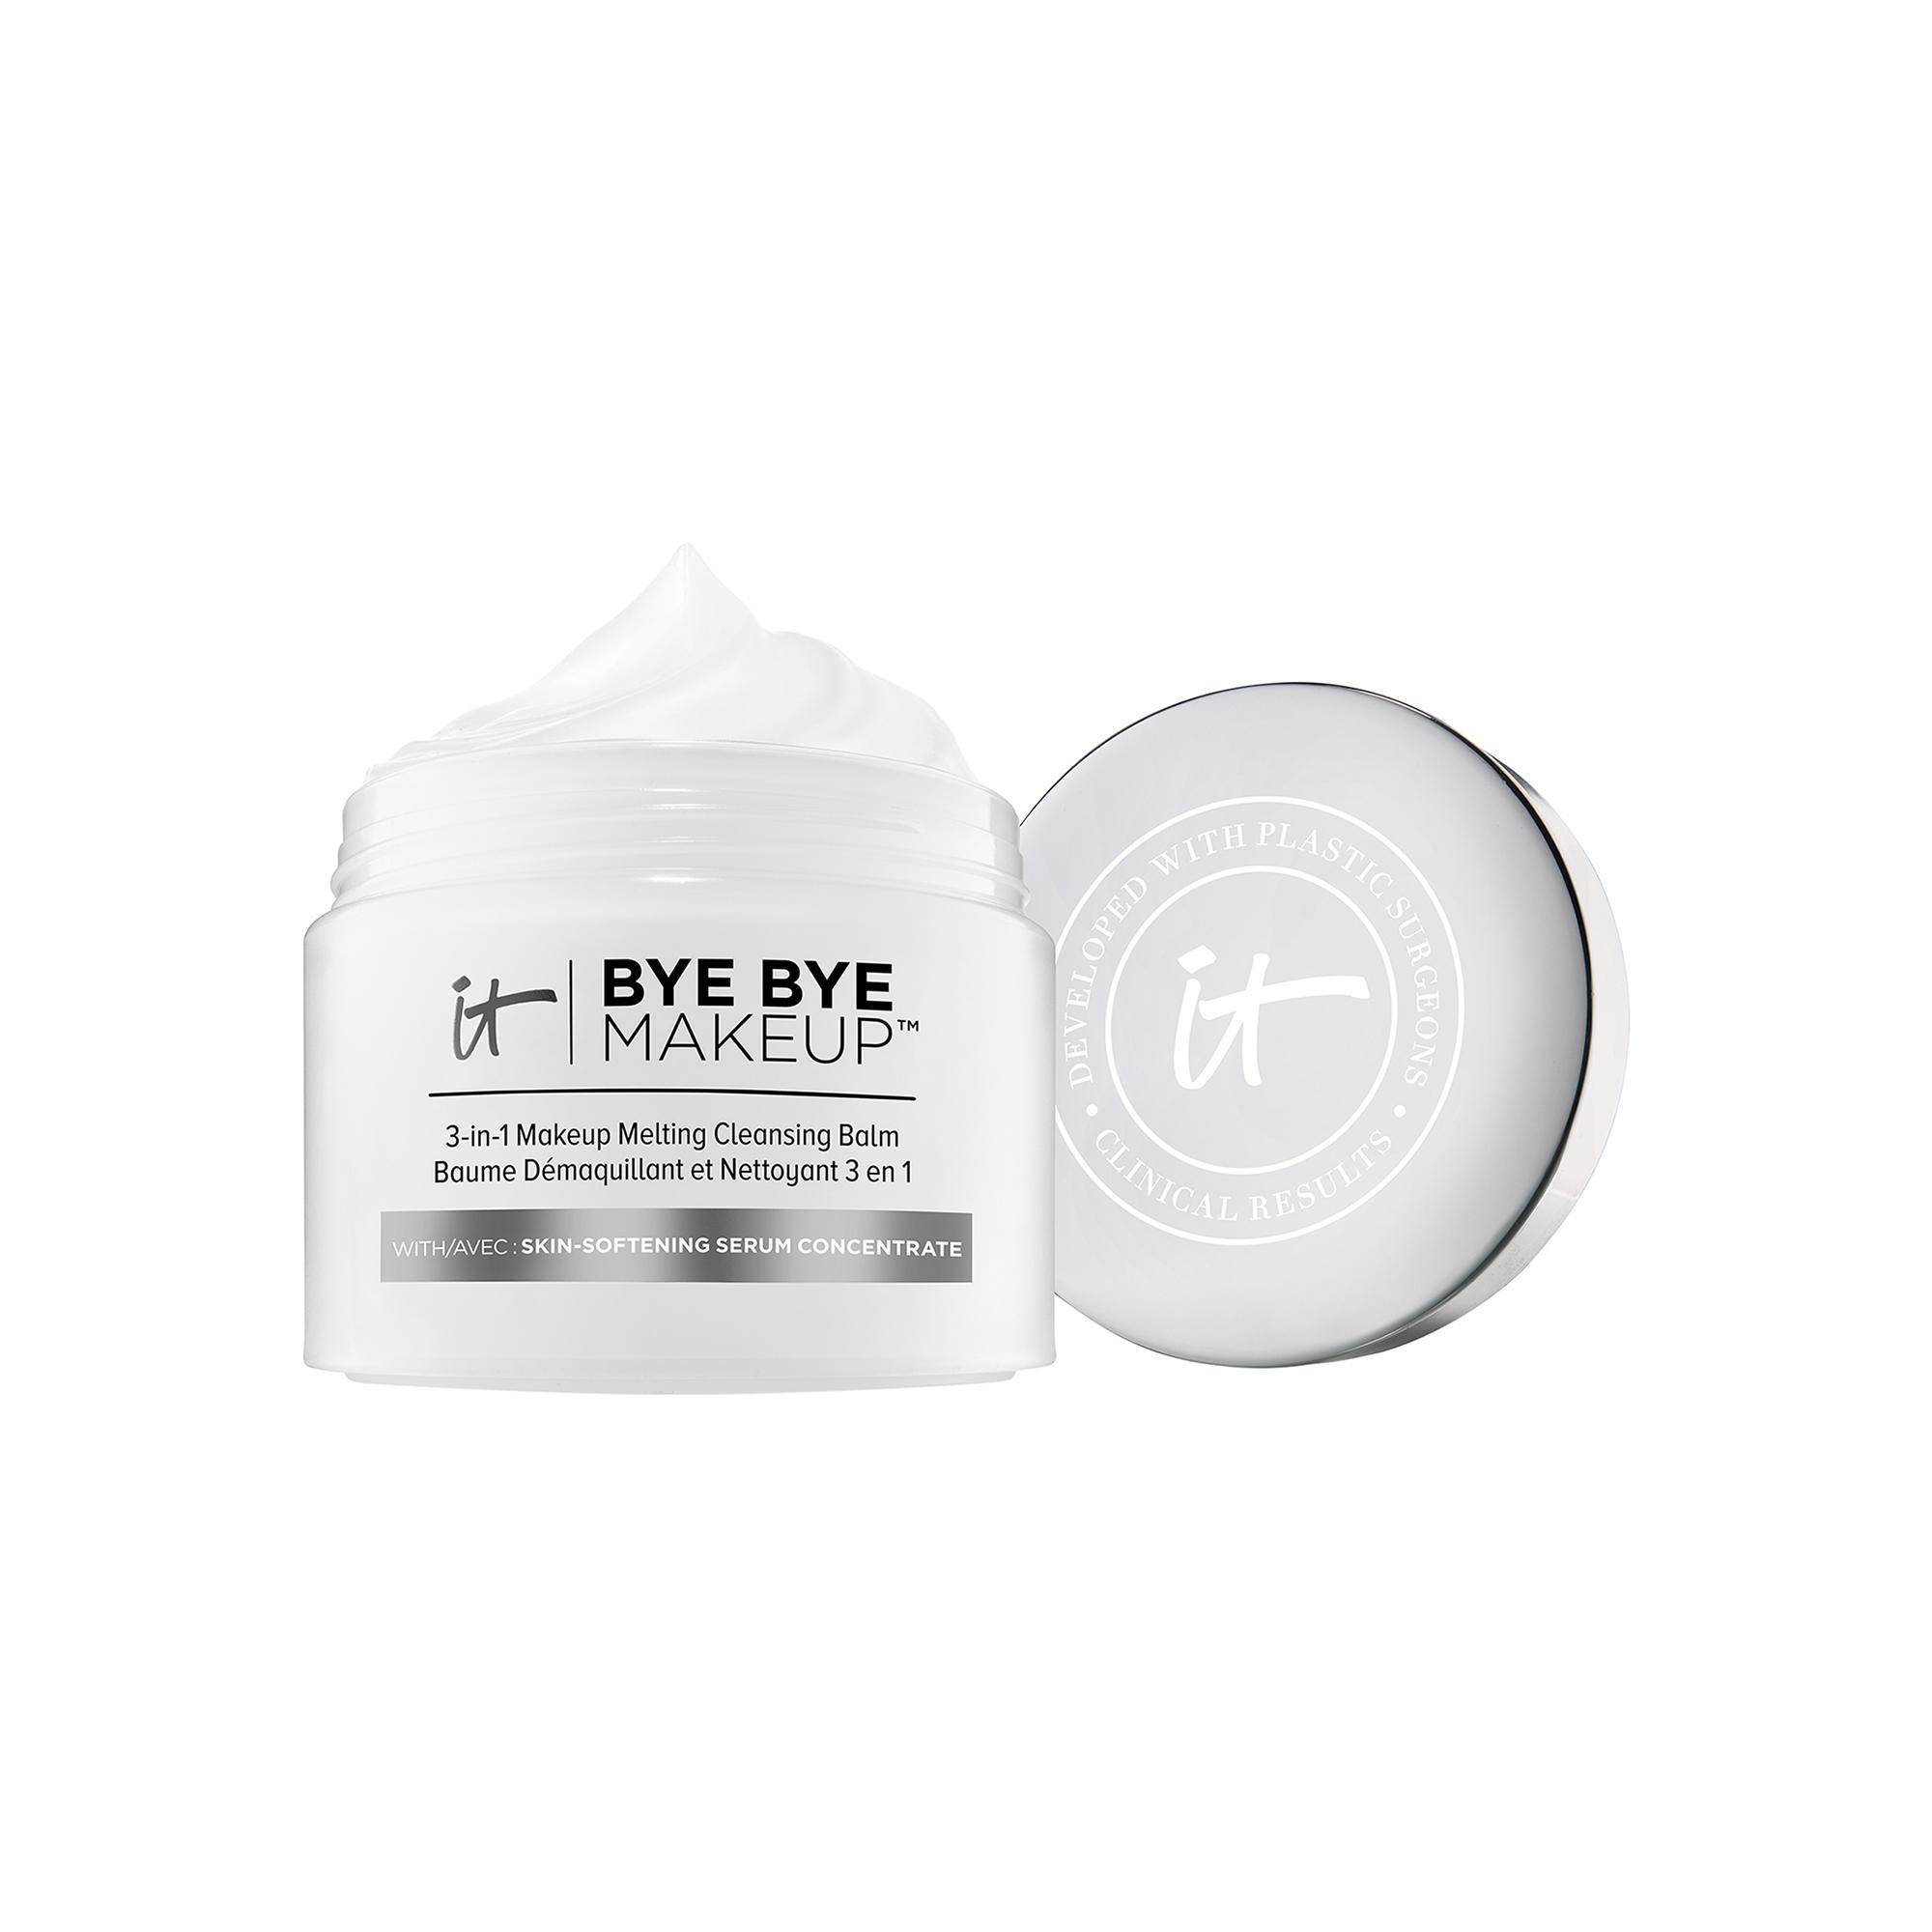 Bye Bye Makeup™ 3-in-1 Makeup Melting Cleansing Balm